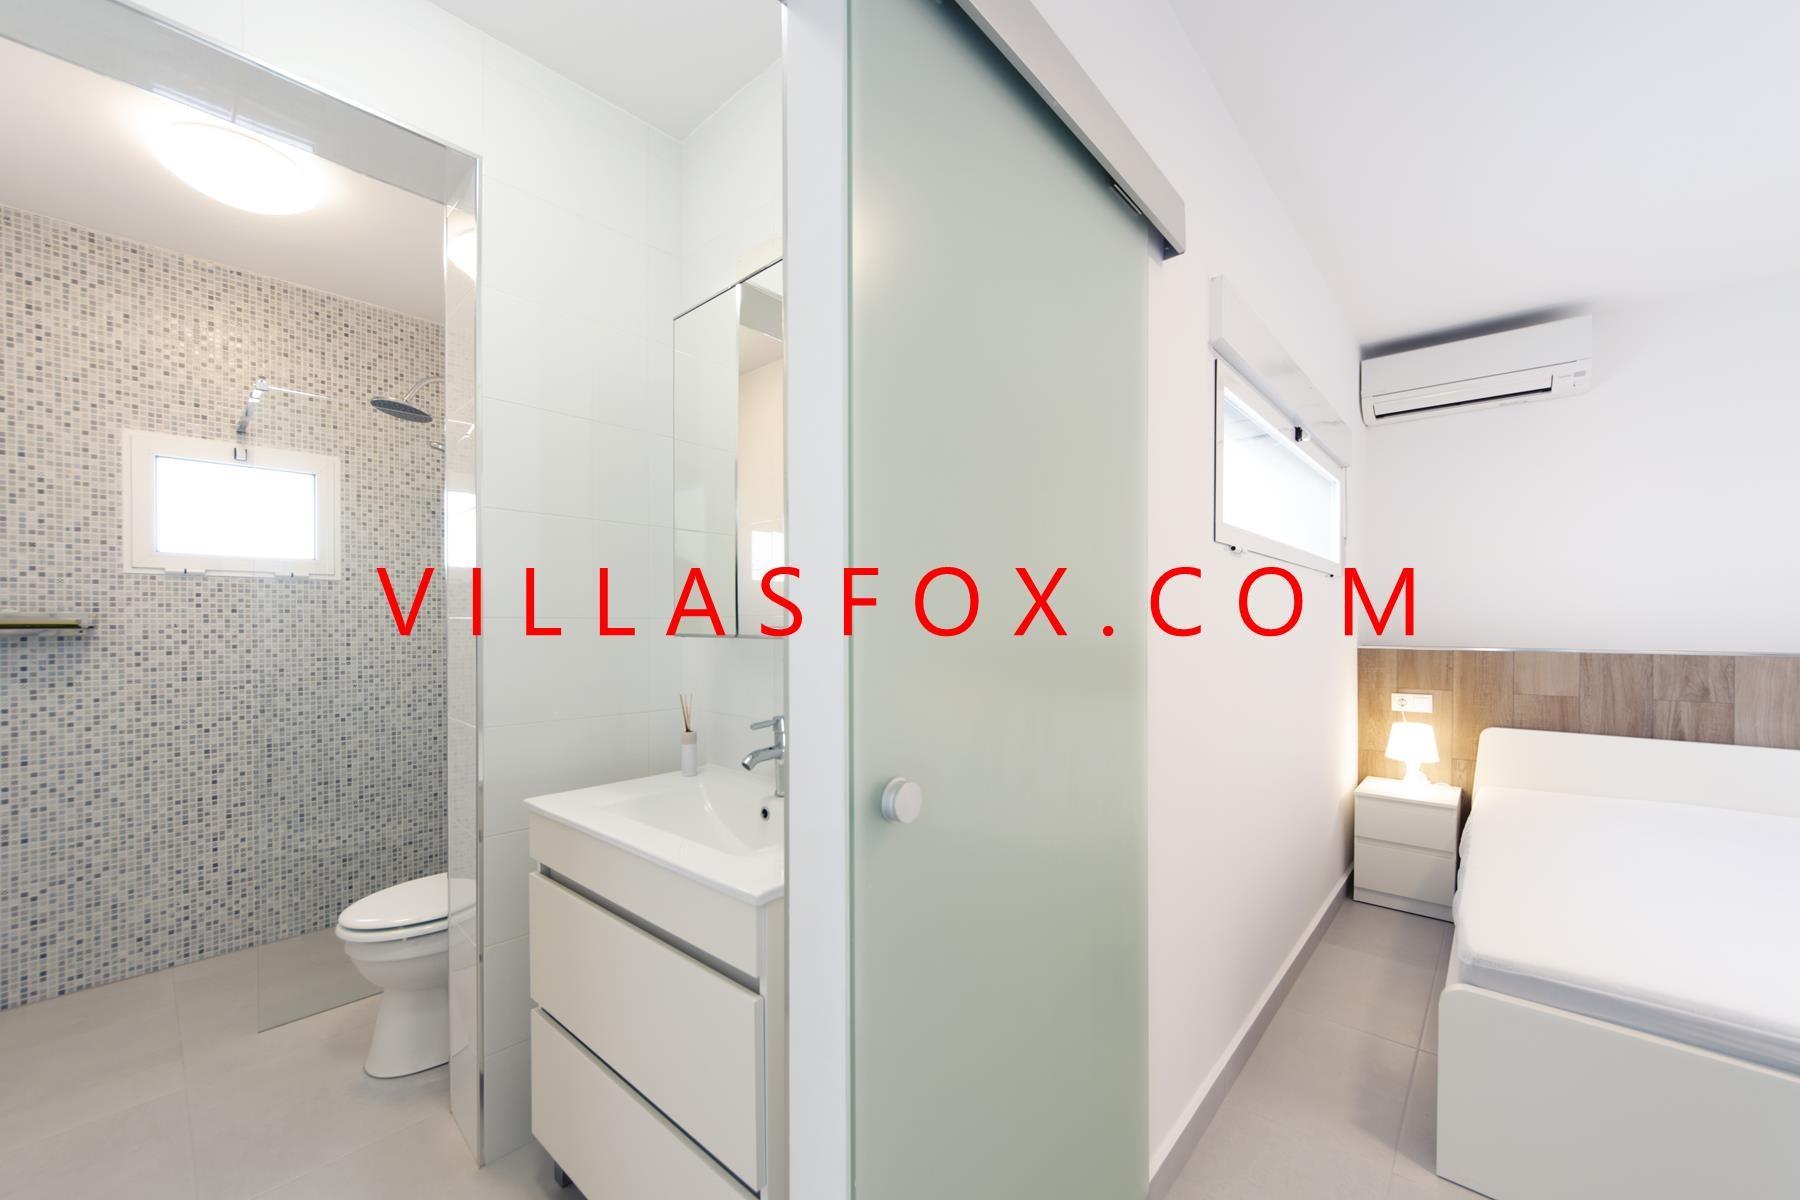 Blue Lagoon (San Miguel de Salinas) modern south-facing luxury villa on one level - stunning!